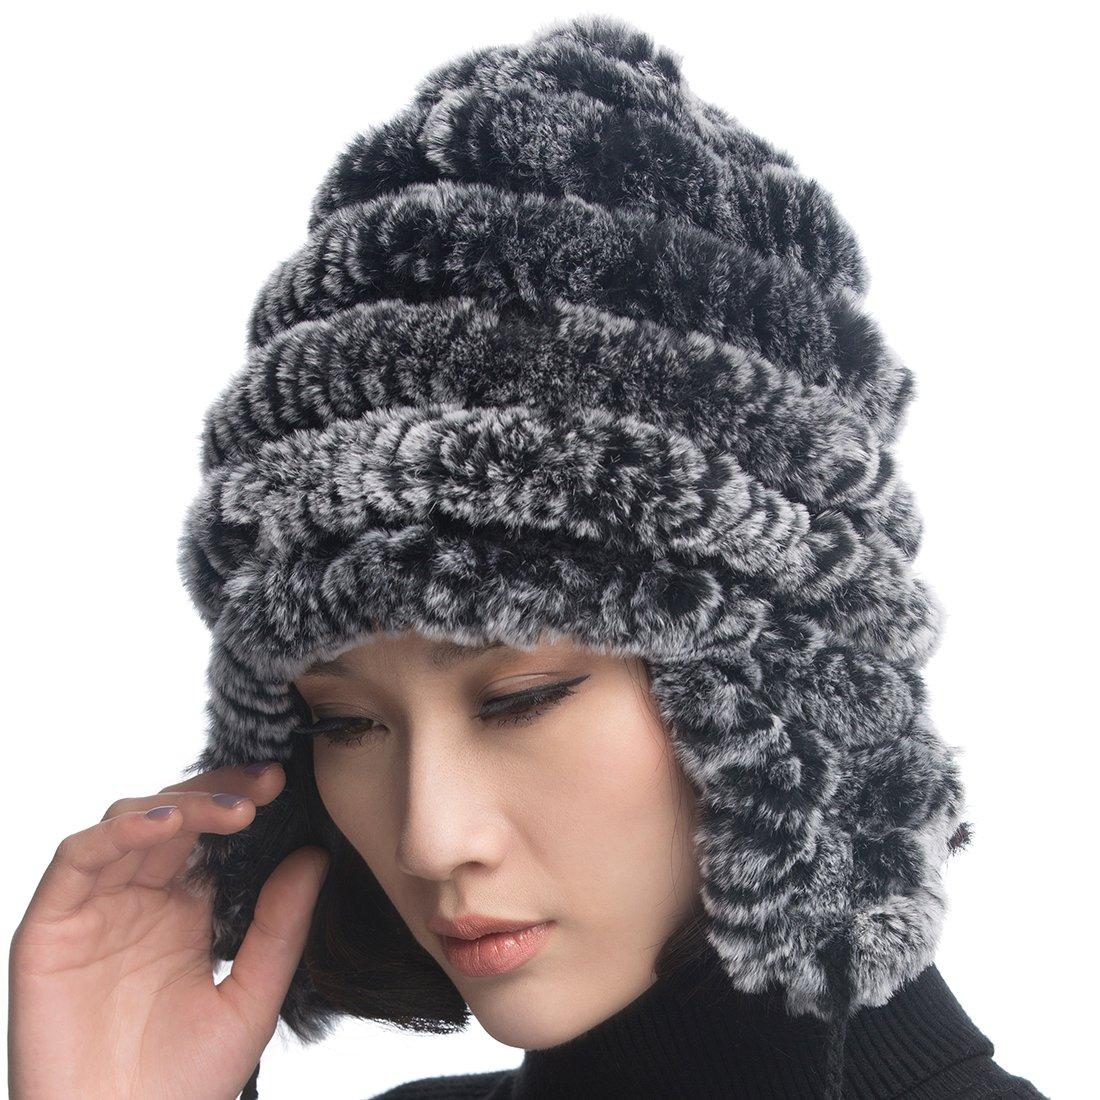 URSFUR Women's Rex Rabbit Fur Hats Winter Ear Cap Flexible Multicolor Black) HB-02-4